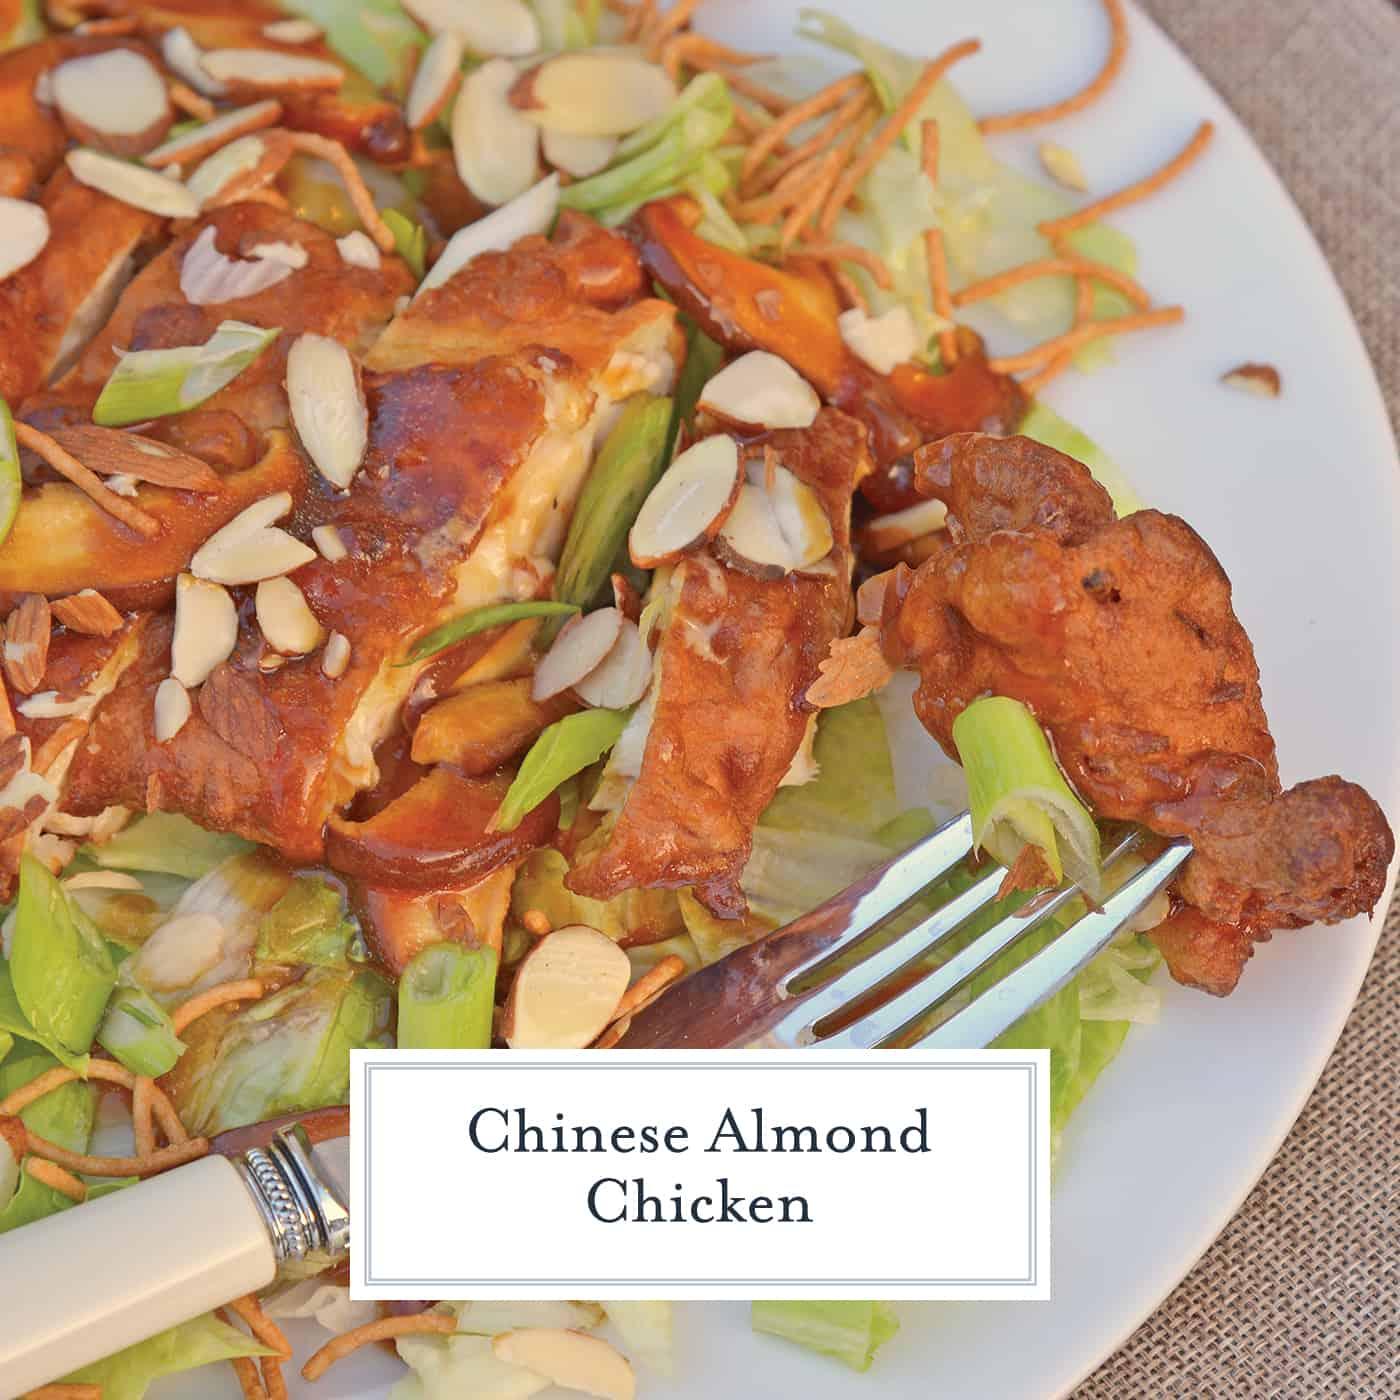 Chinese Almond Chicken, aka Detroit Almond Chicken, ABC Chicken or Almond Boneless Chicken, is a dish with fried chicken and mushroom gravy served over iceberg lettuce. #almondchicken #almondbonelesschicken www.savoryexperiments.com